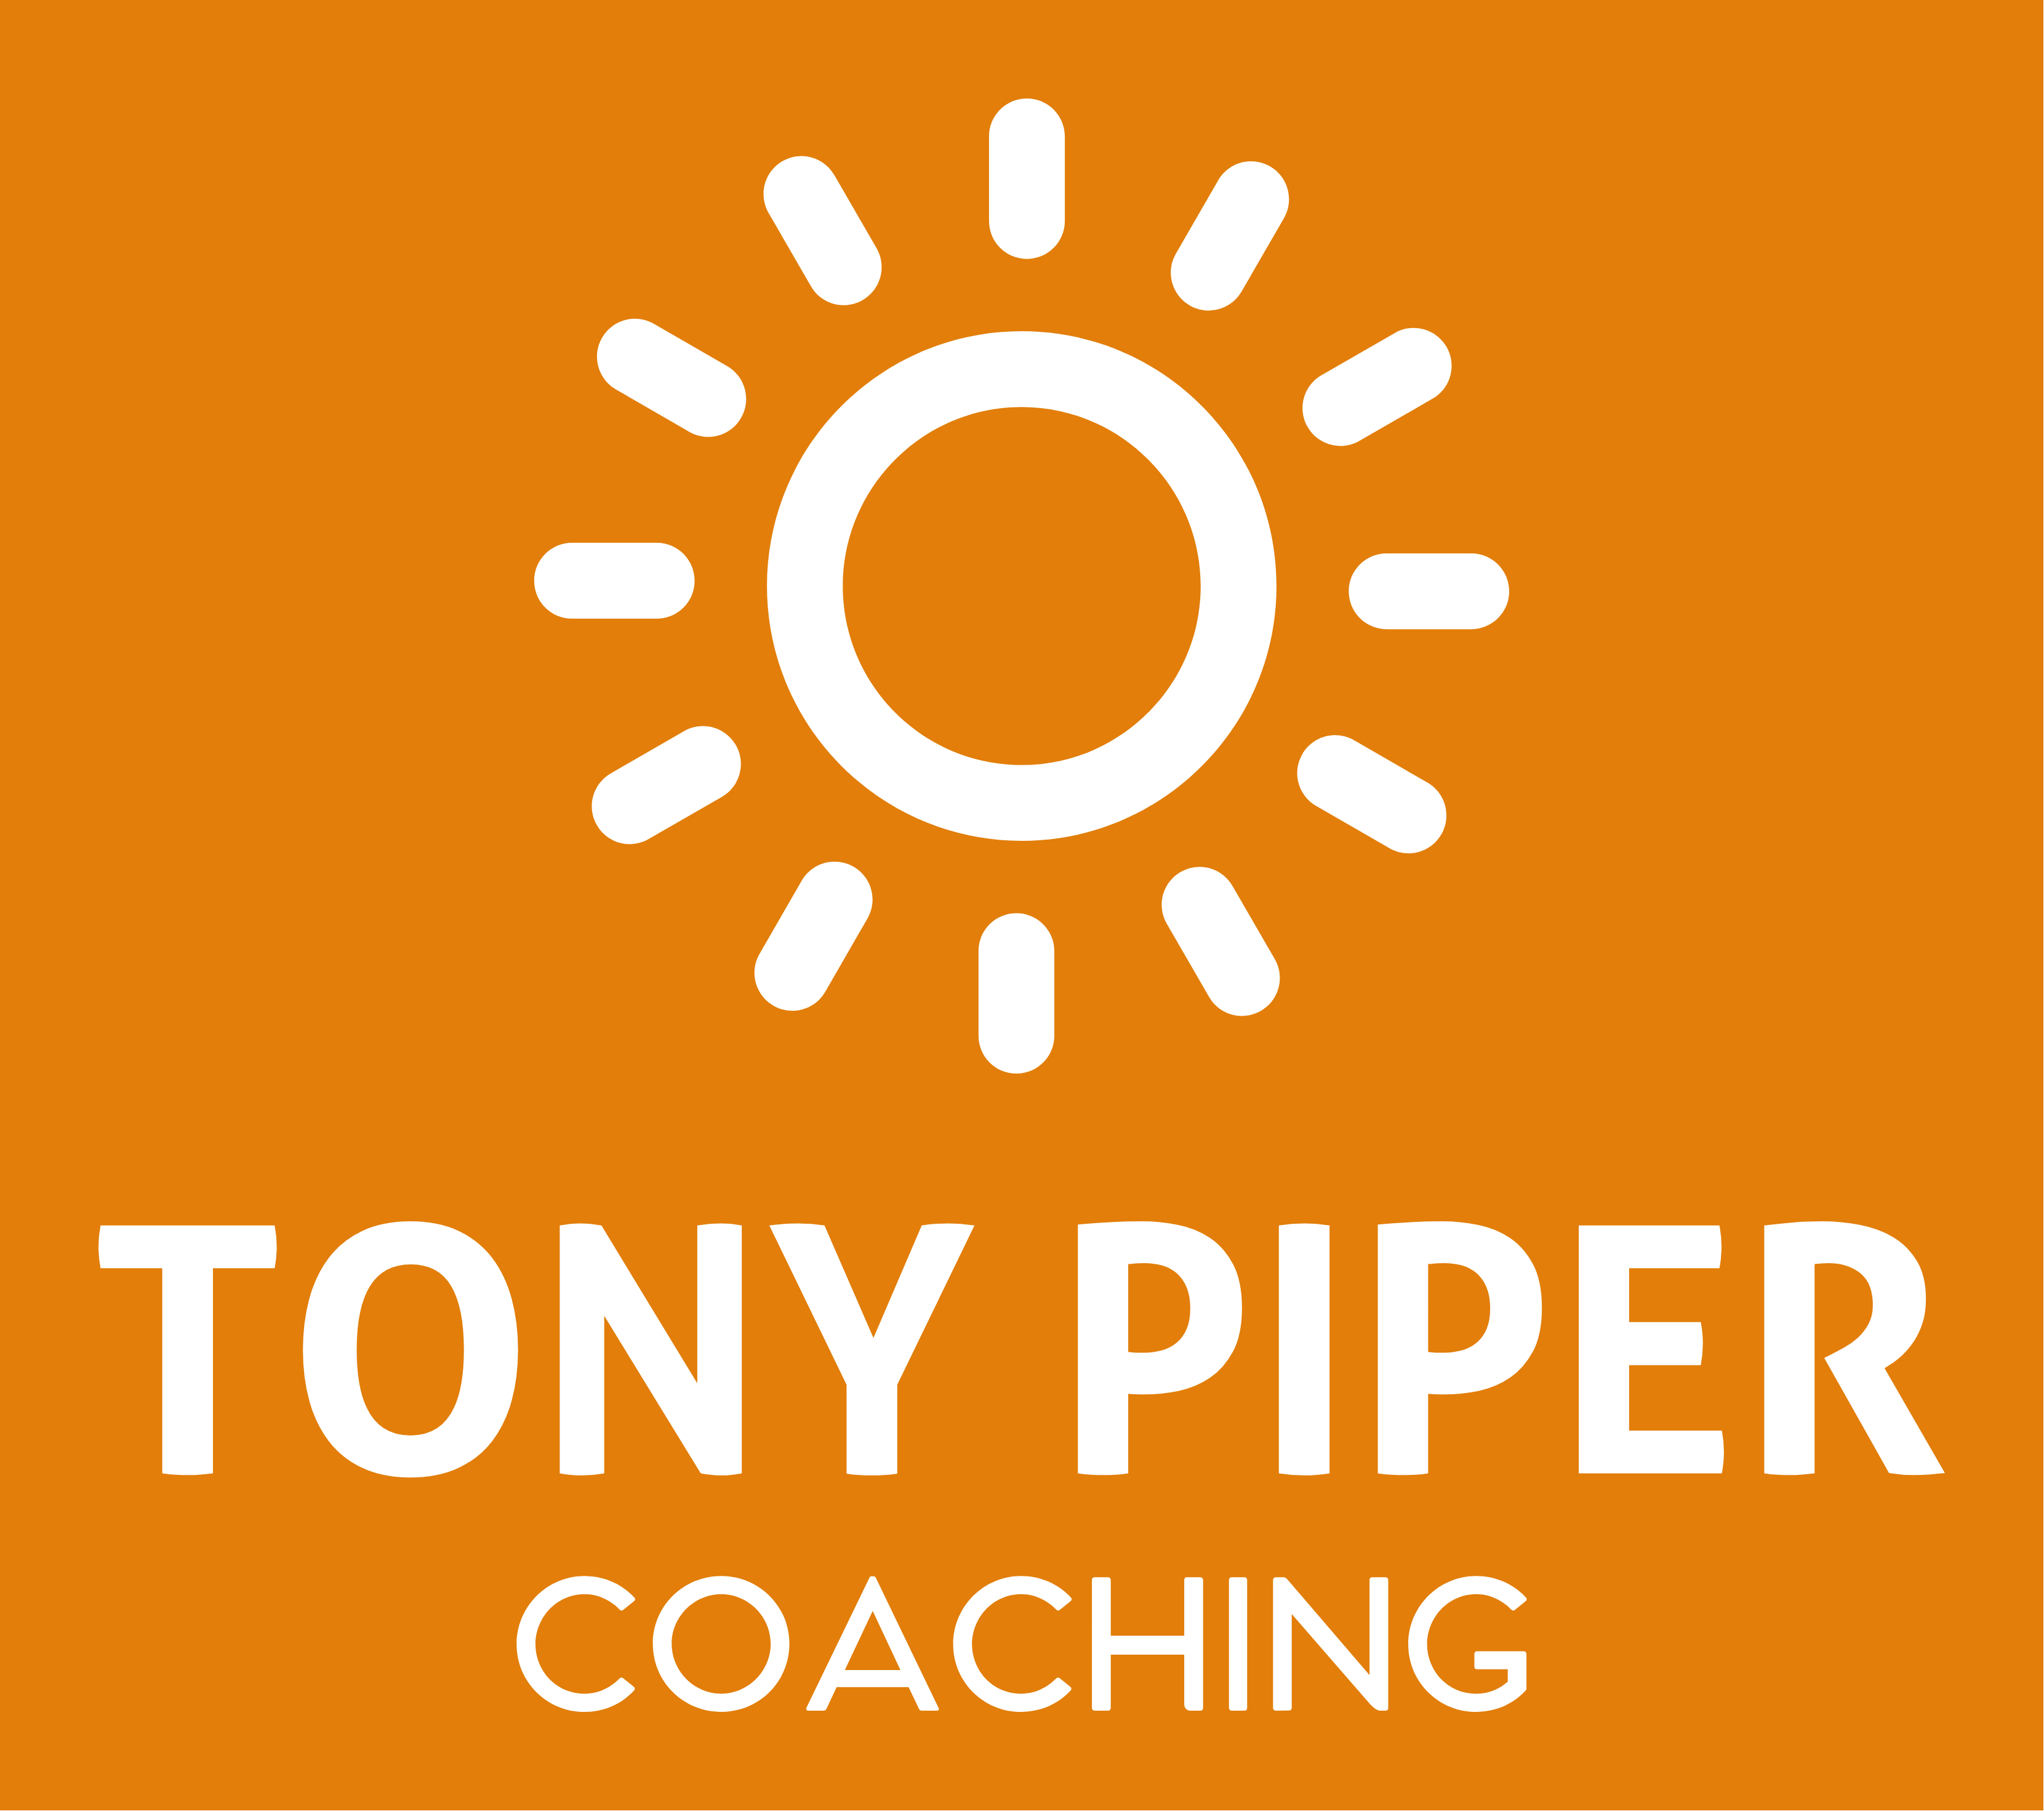 Tony Piper Coaching